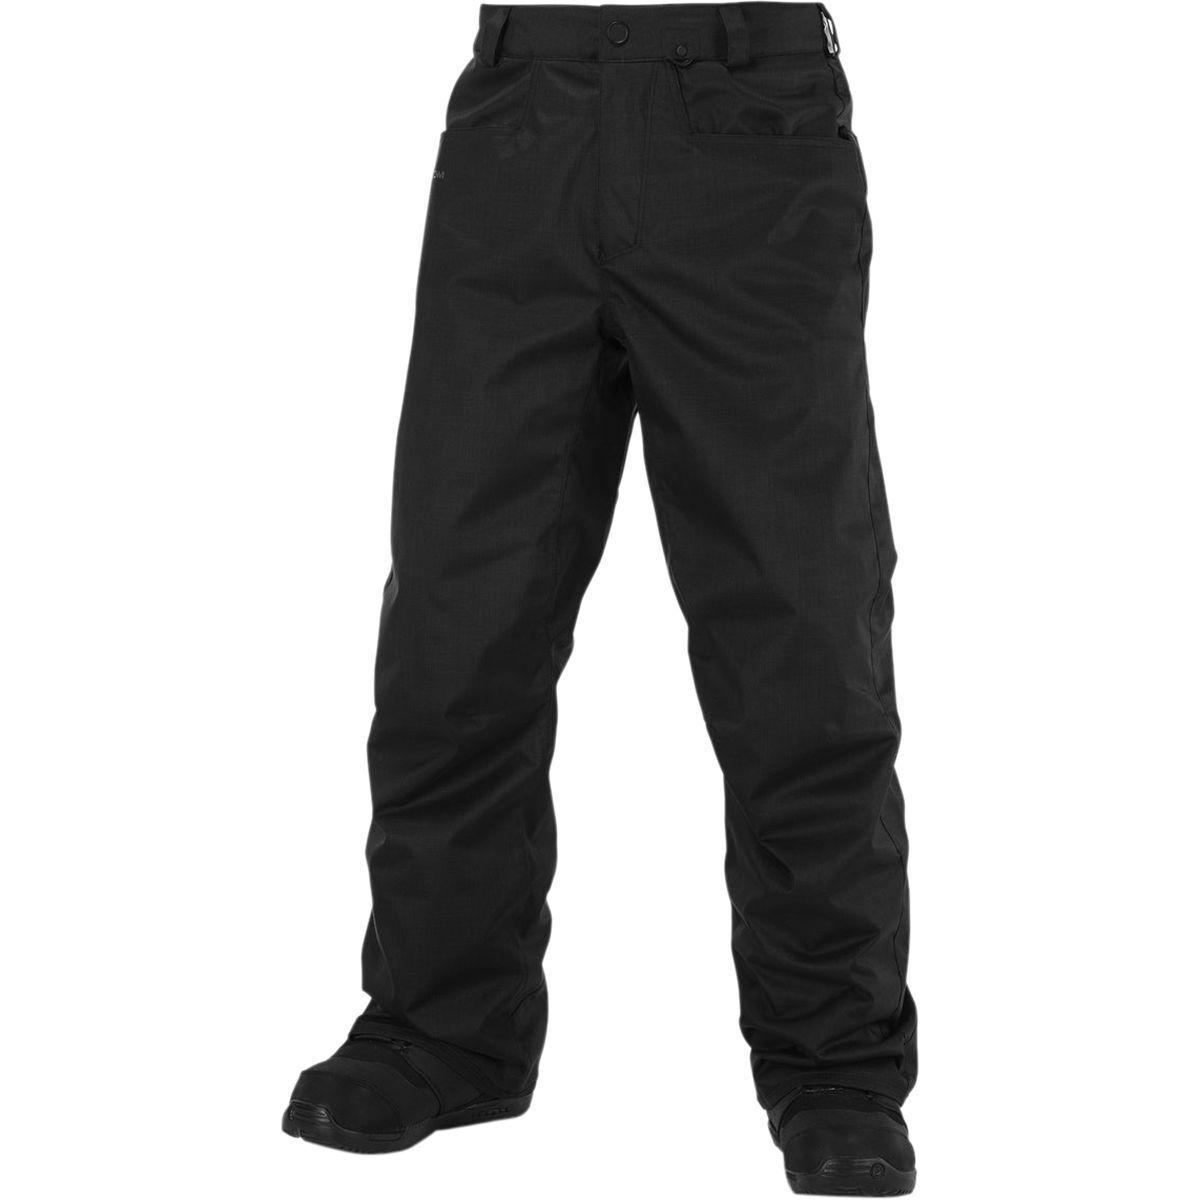 VOLCOM Men's CARBON Snow Pants - BLK - XL - NWT